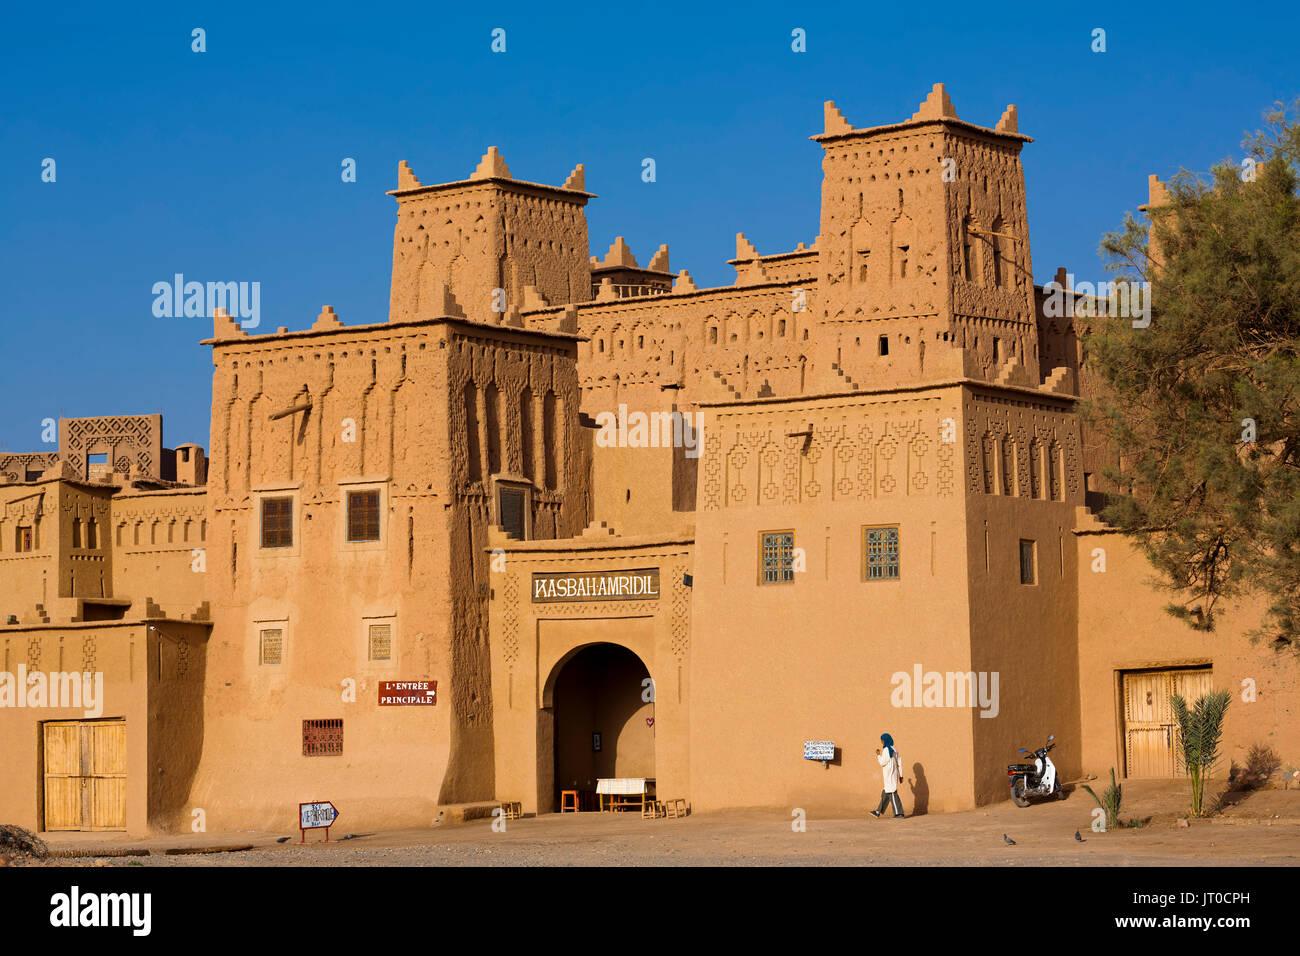 Hôtel Kasbah Amridil, vallée du Dadès, Skoura. Le Maroc, Maghreb, Afrique du Nord Photo Stock